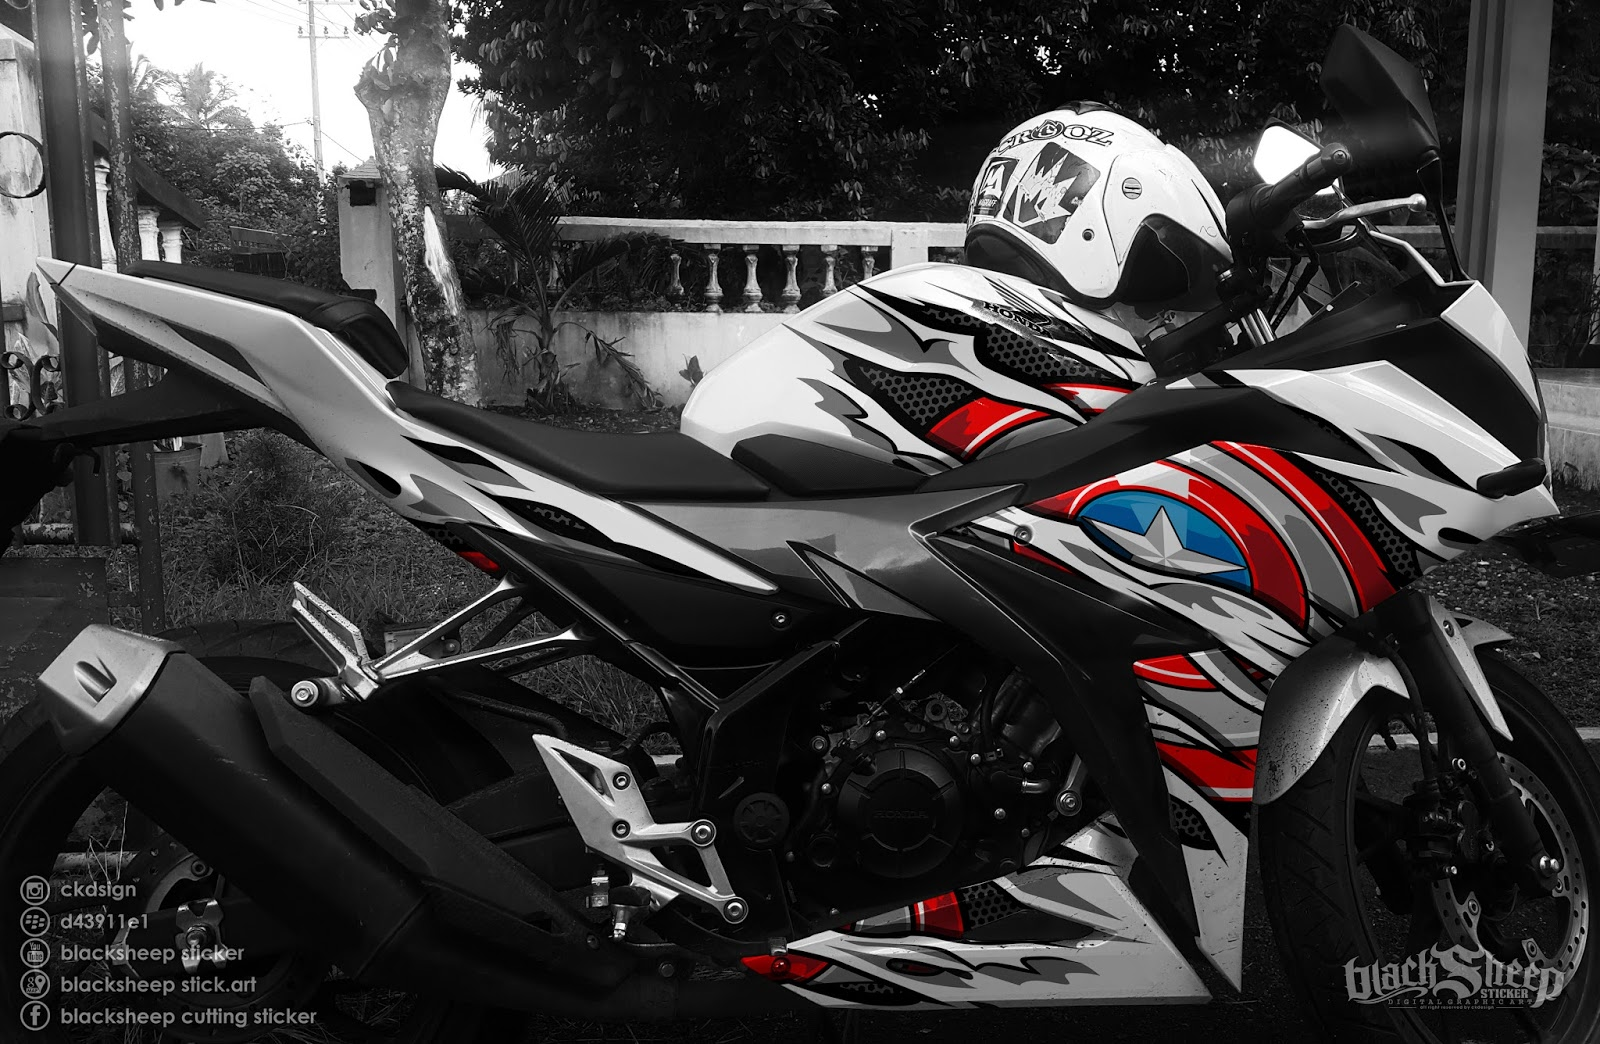 Cutting Sticker Motor Samurai X The Stickers Source Honda Cbr150r Facelift Captain America Blacksheep